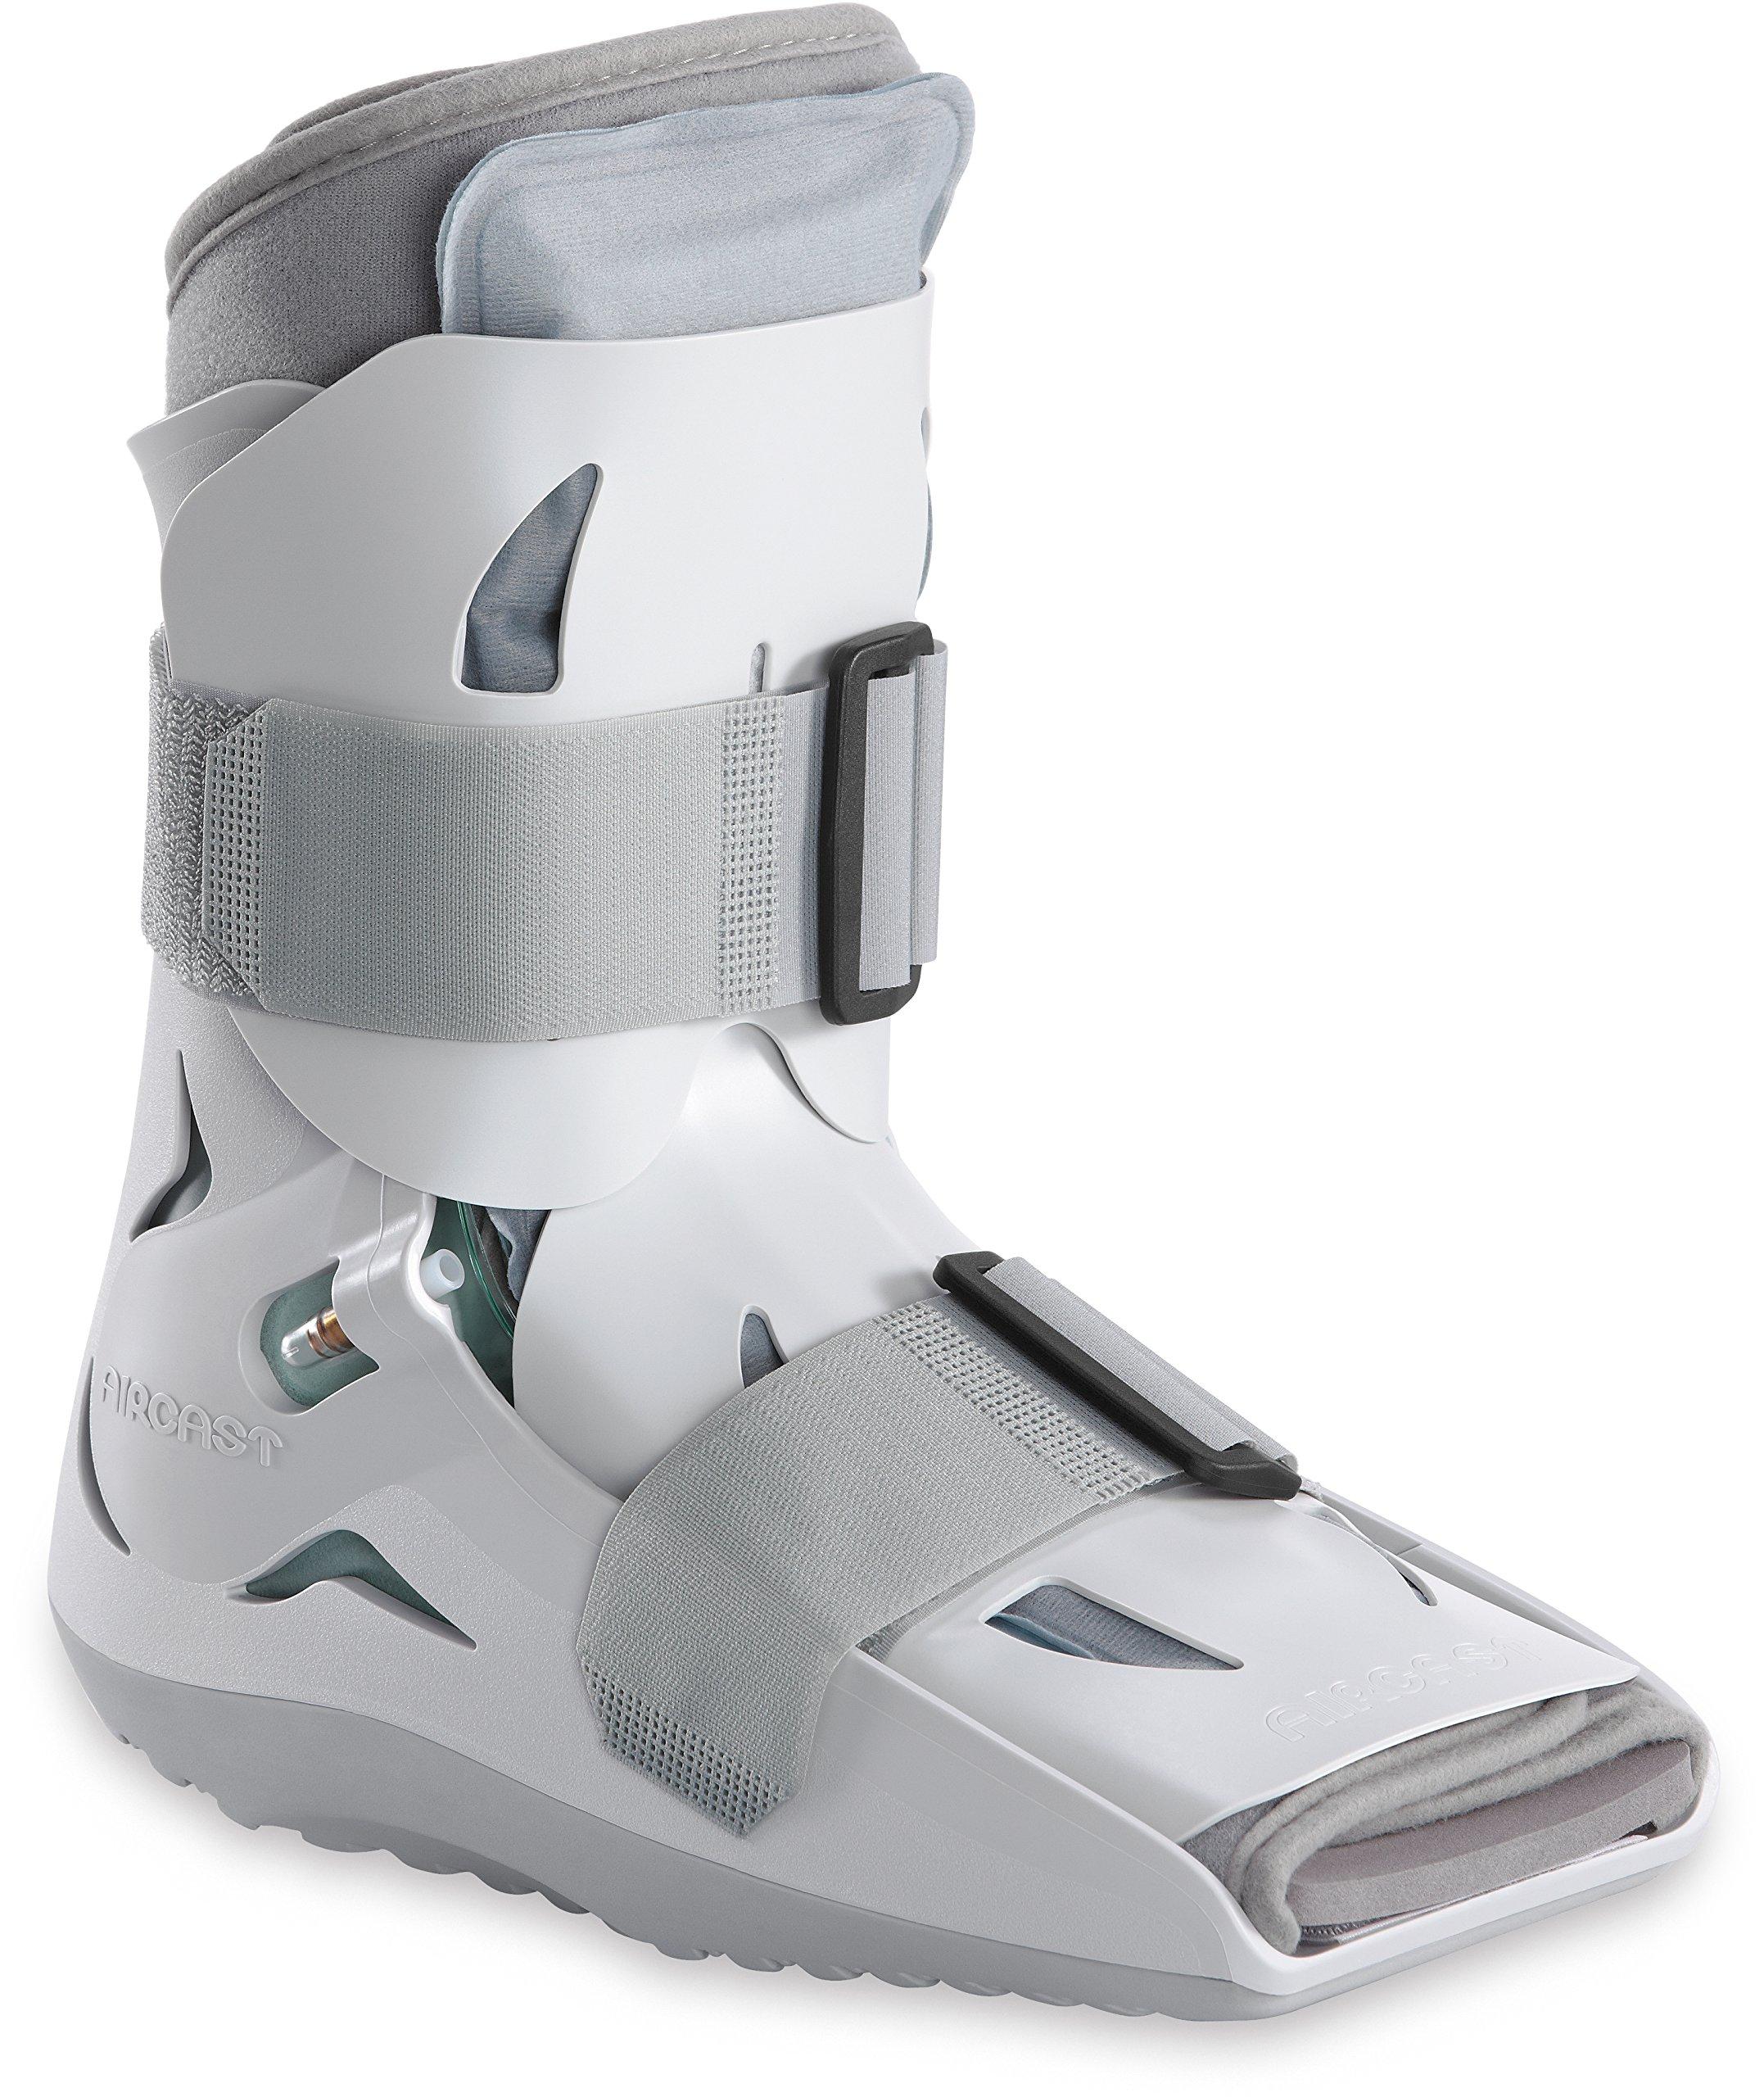 Aircast SP (Short Pneumatic) Walker Brace / Walking Boot, Medium by Aircast